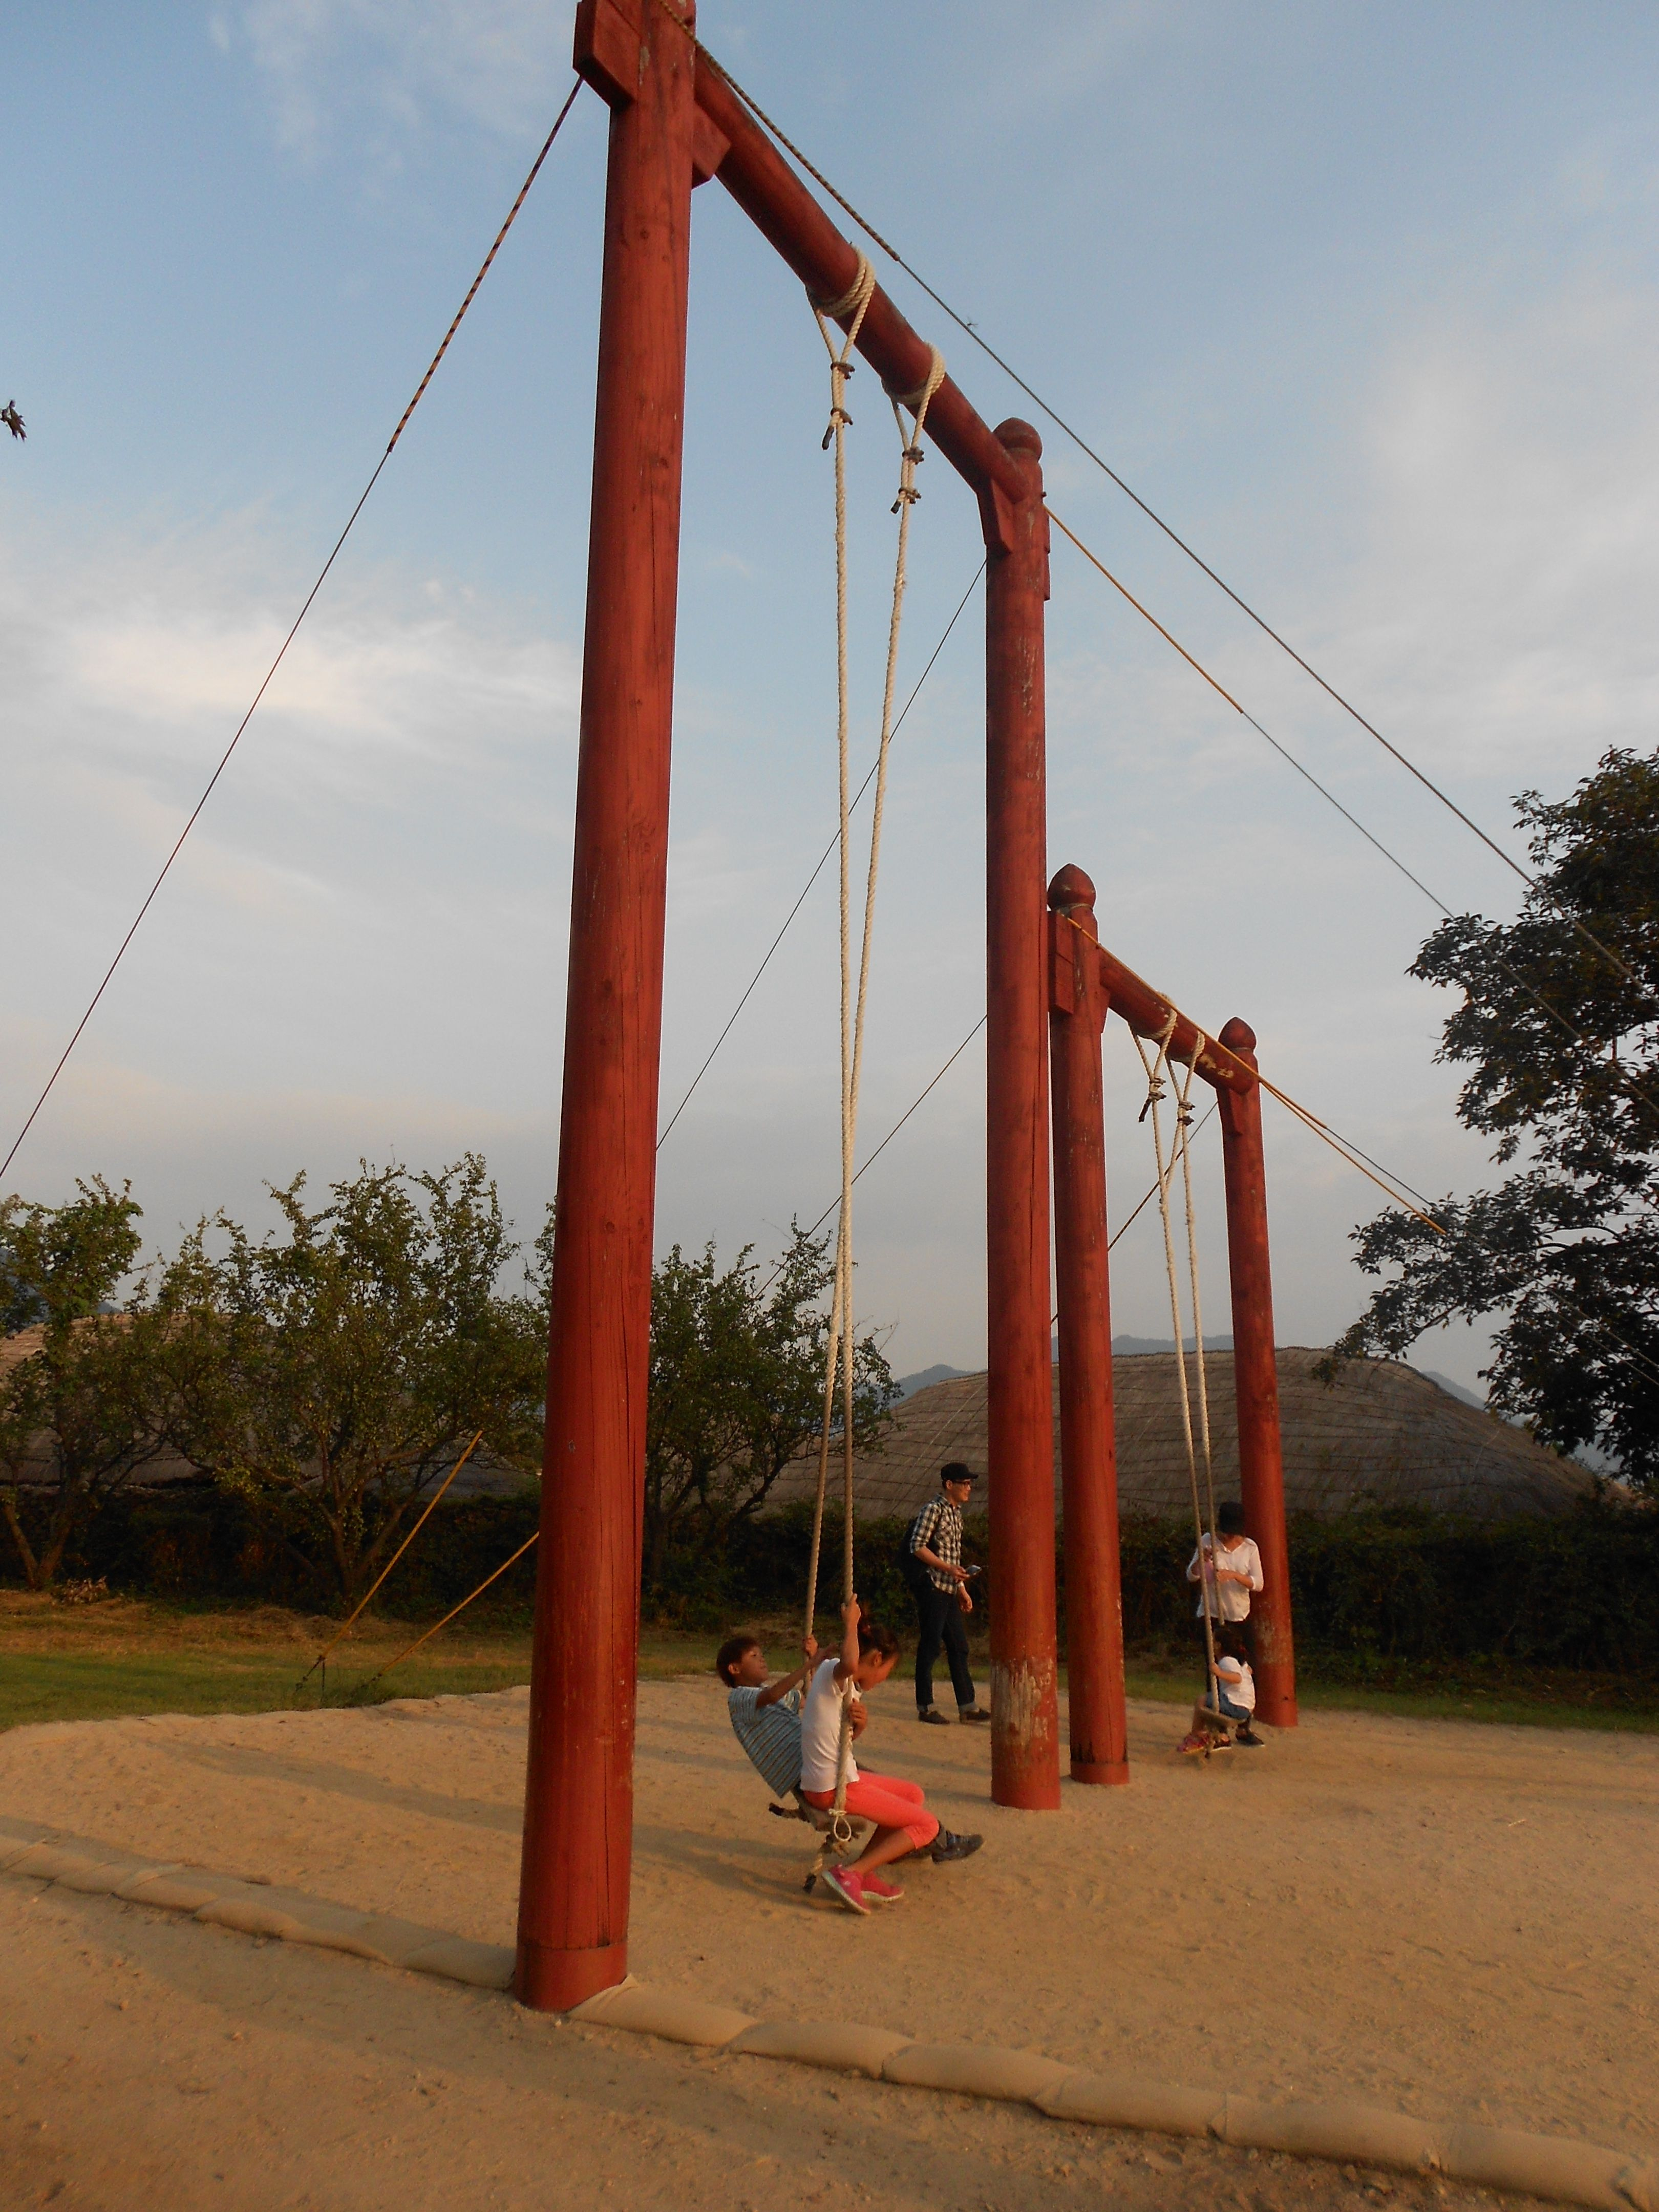 Traditional Swing For Living Room: Kune (그네) A Traditional Korean Swing. -Naganeupseong Folk